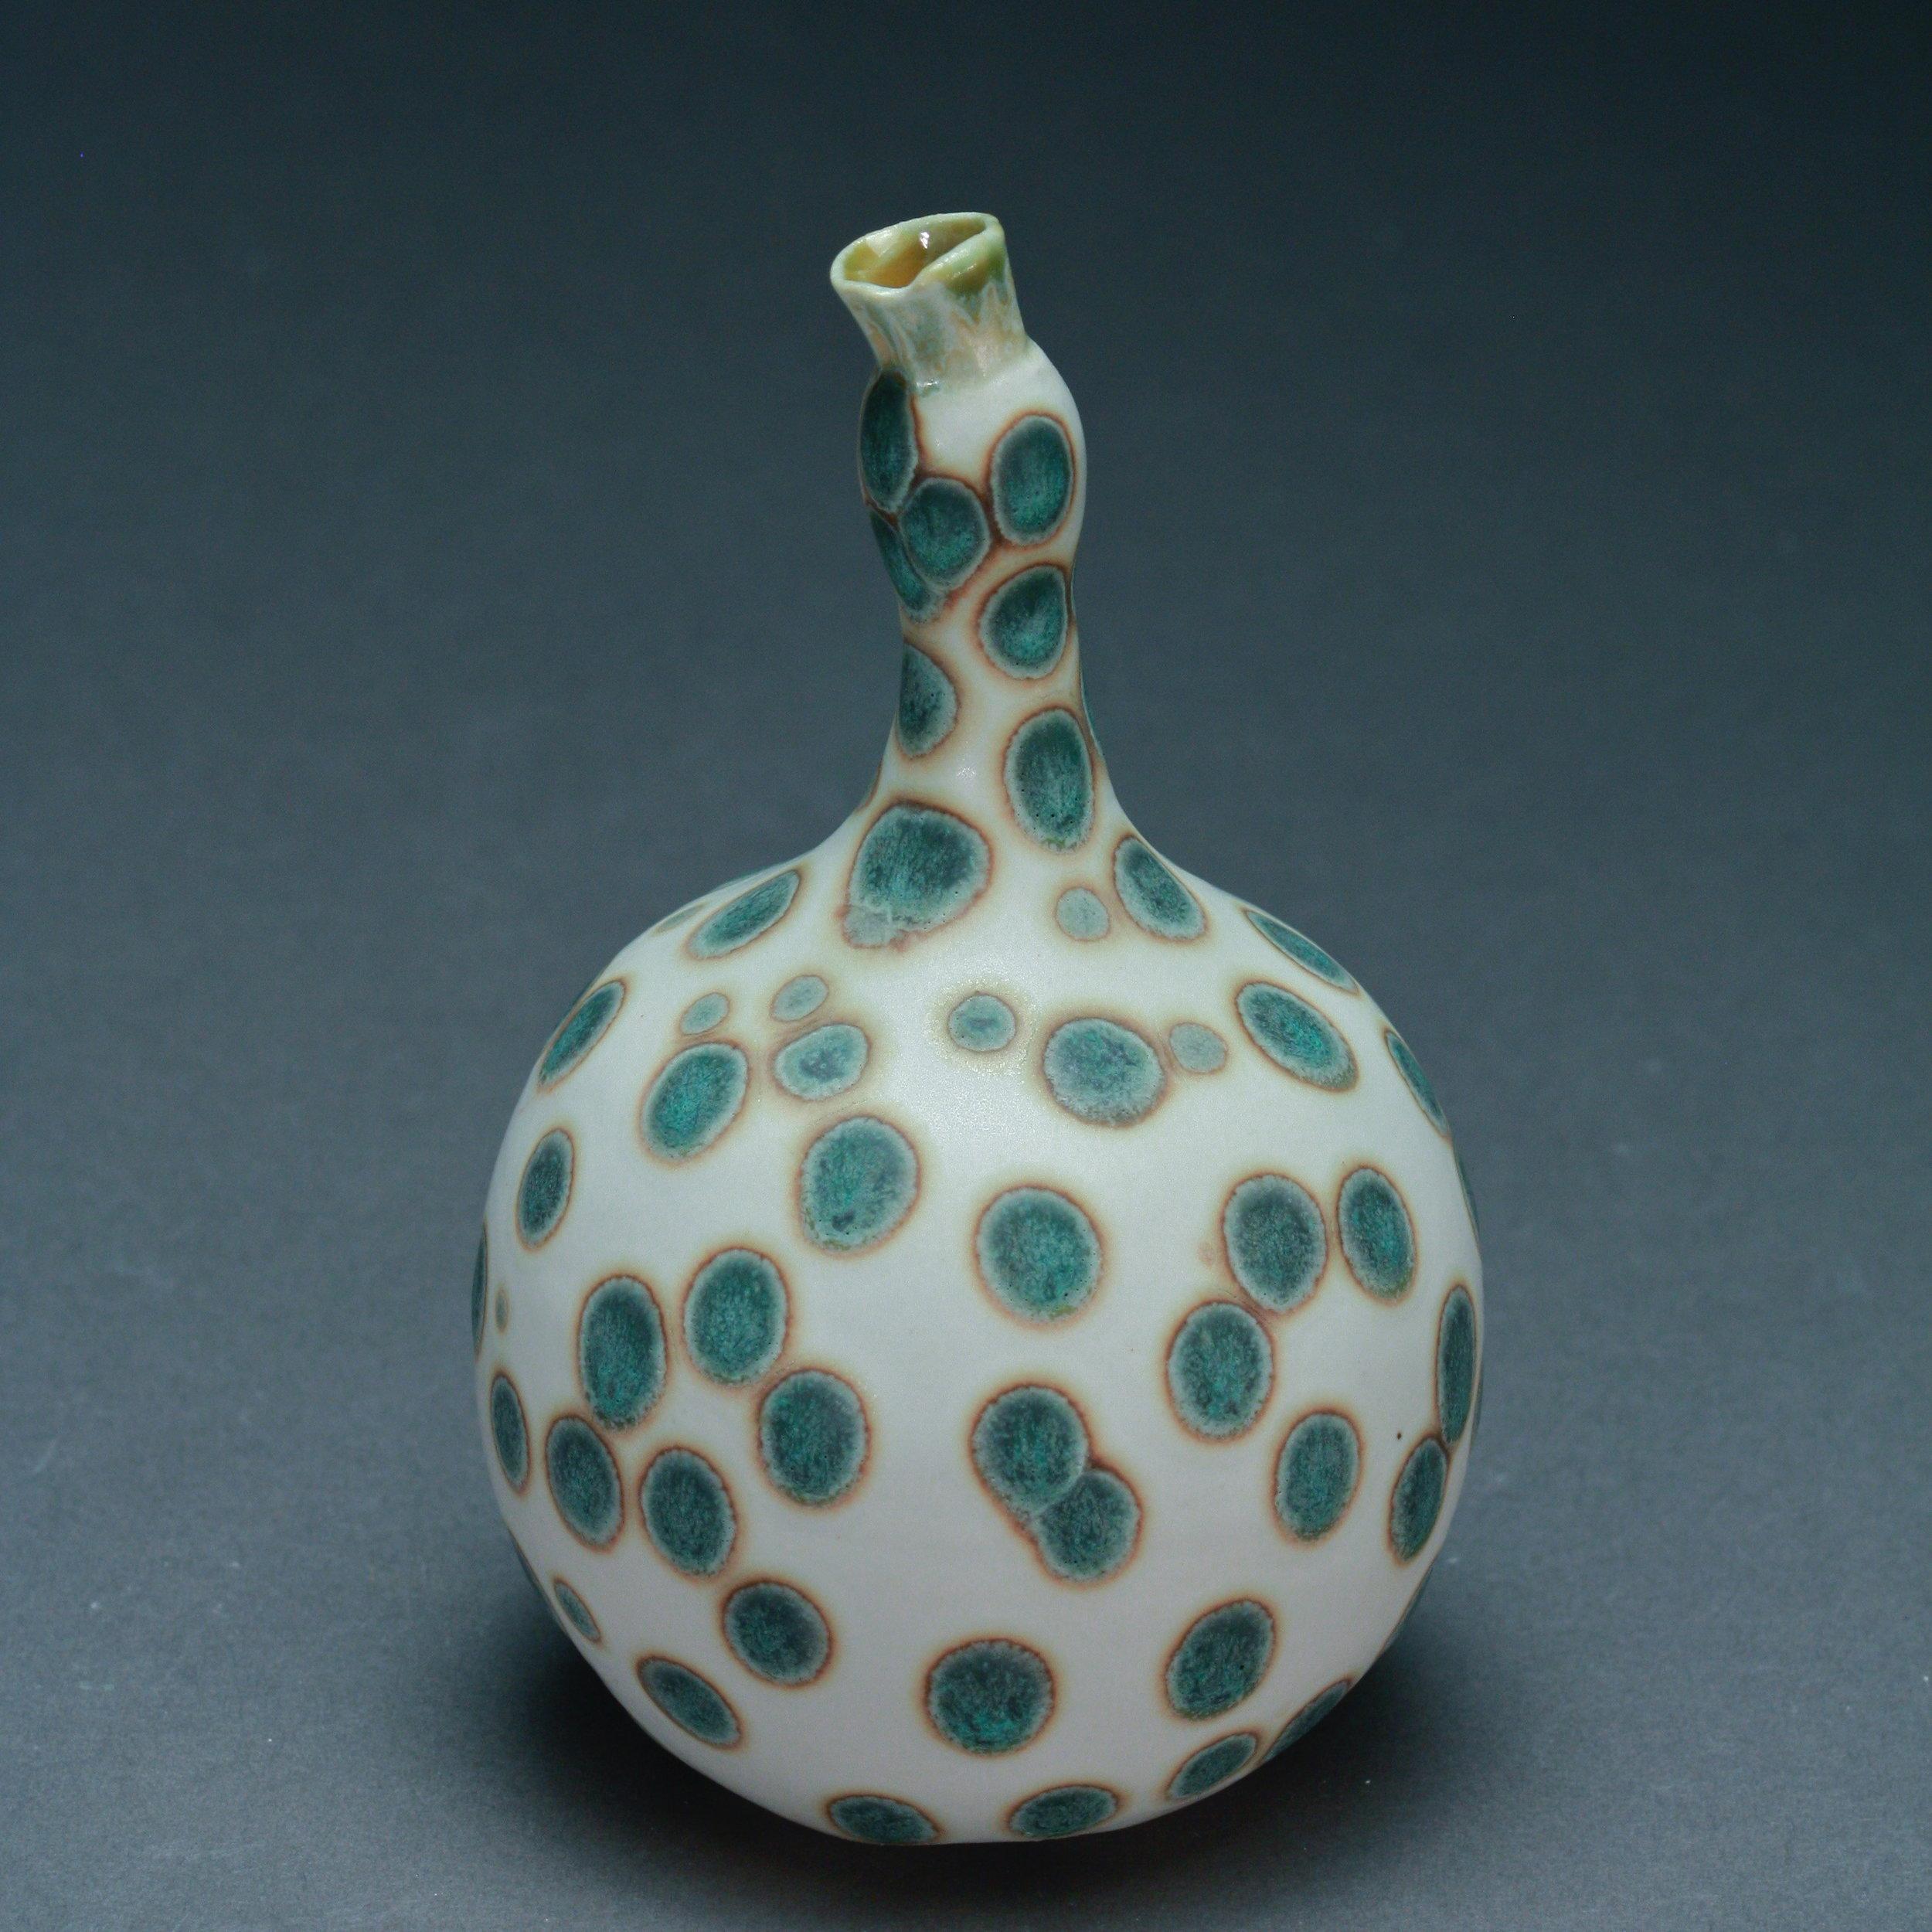 FV-04 | Spotted White Gourd ($60)